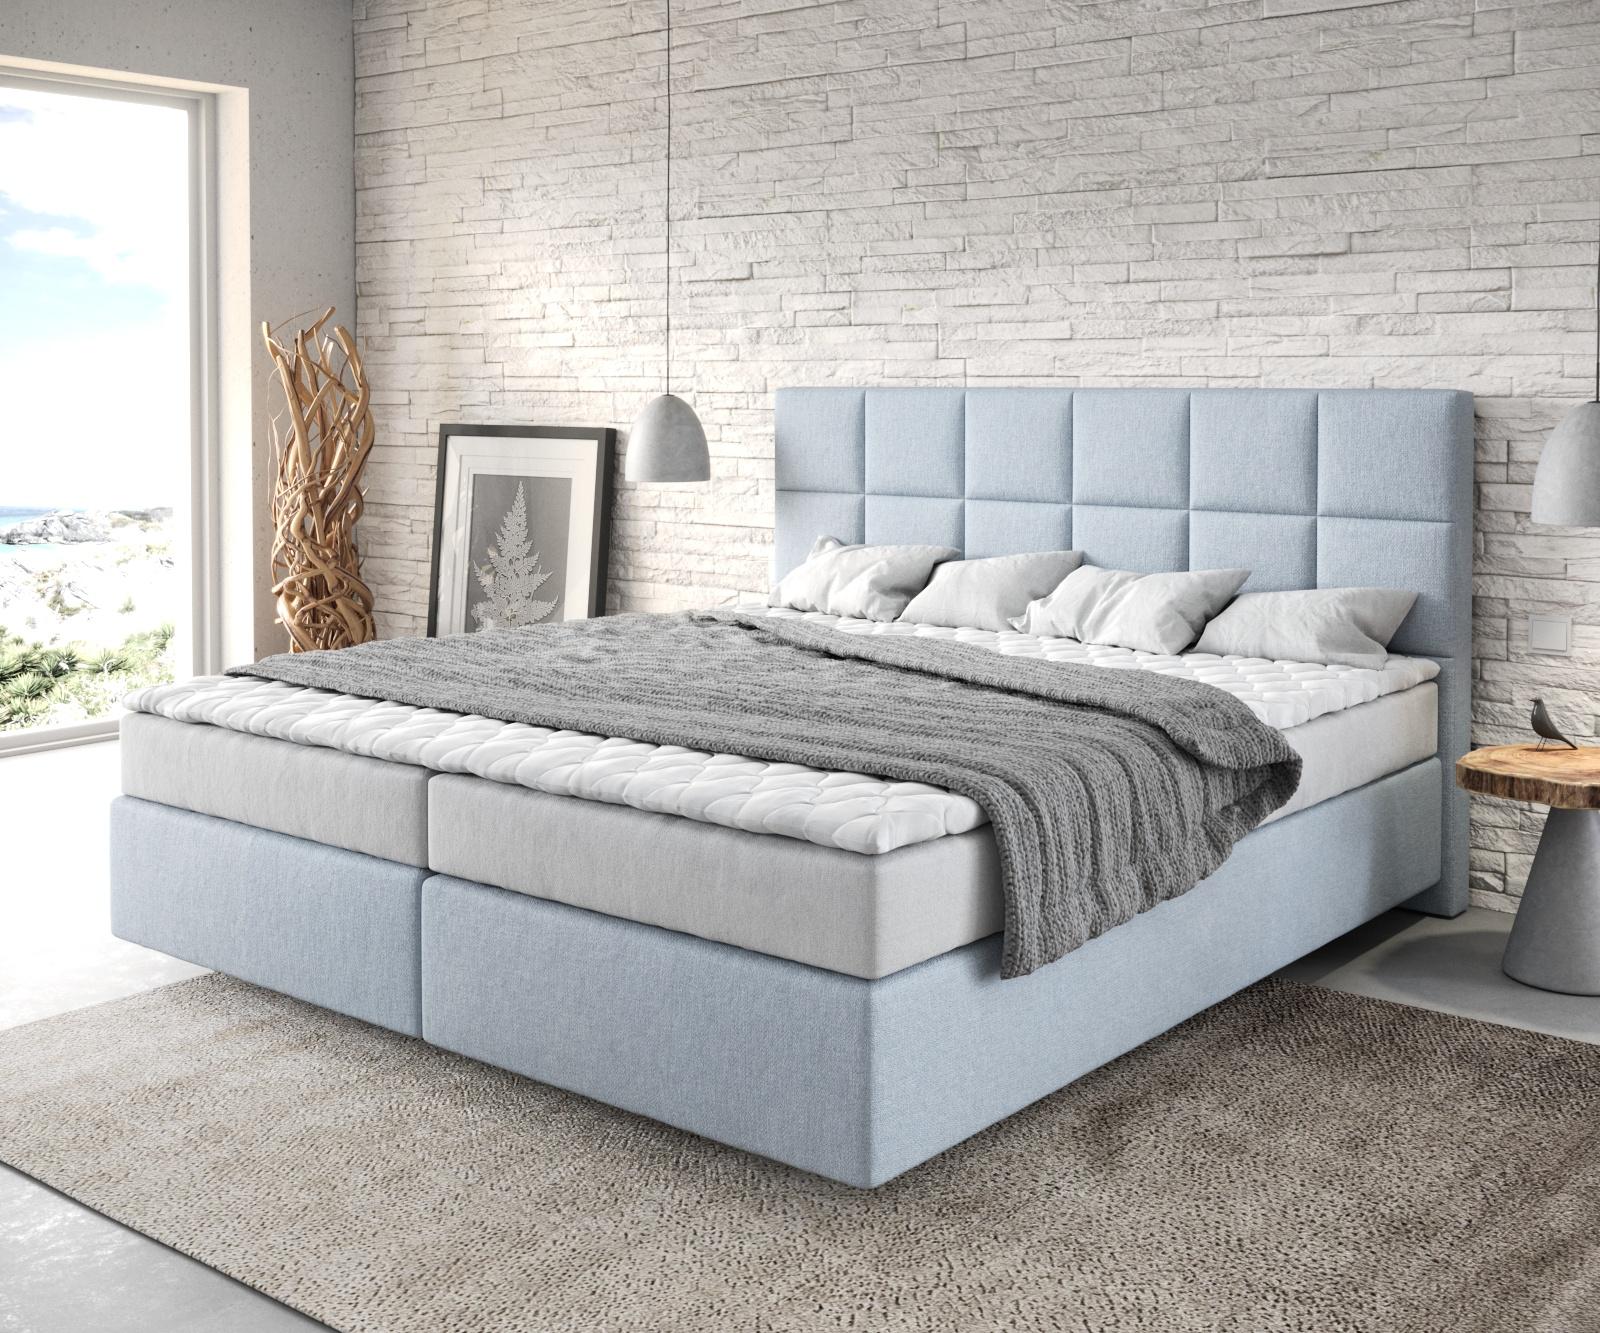 Boxspringbett Dream-Fine 180x200 Flachgewebe Pastellblau